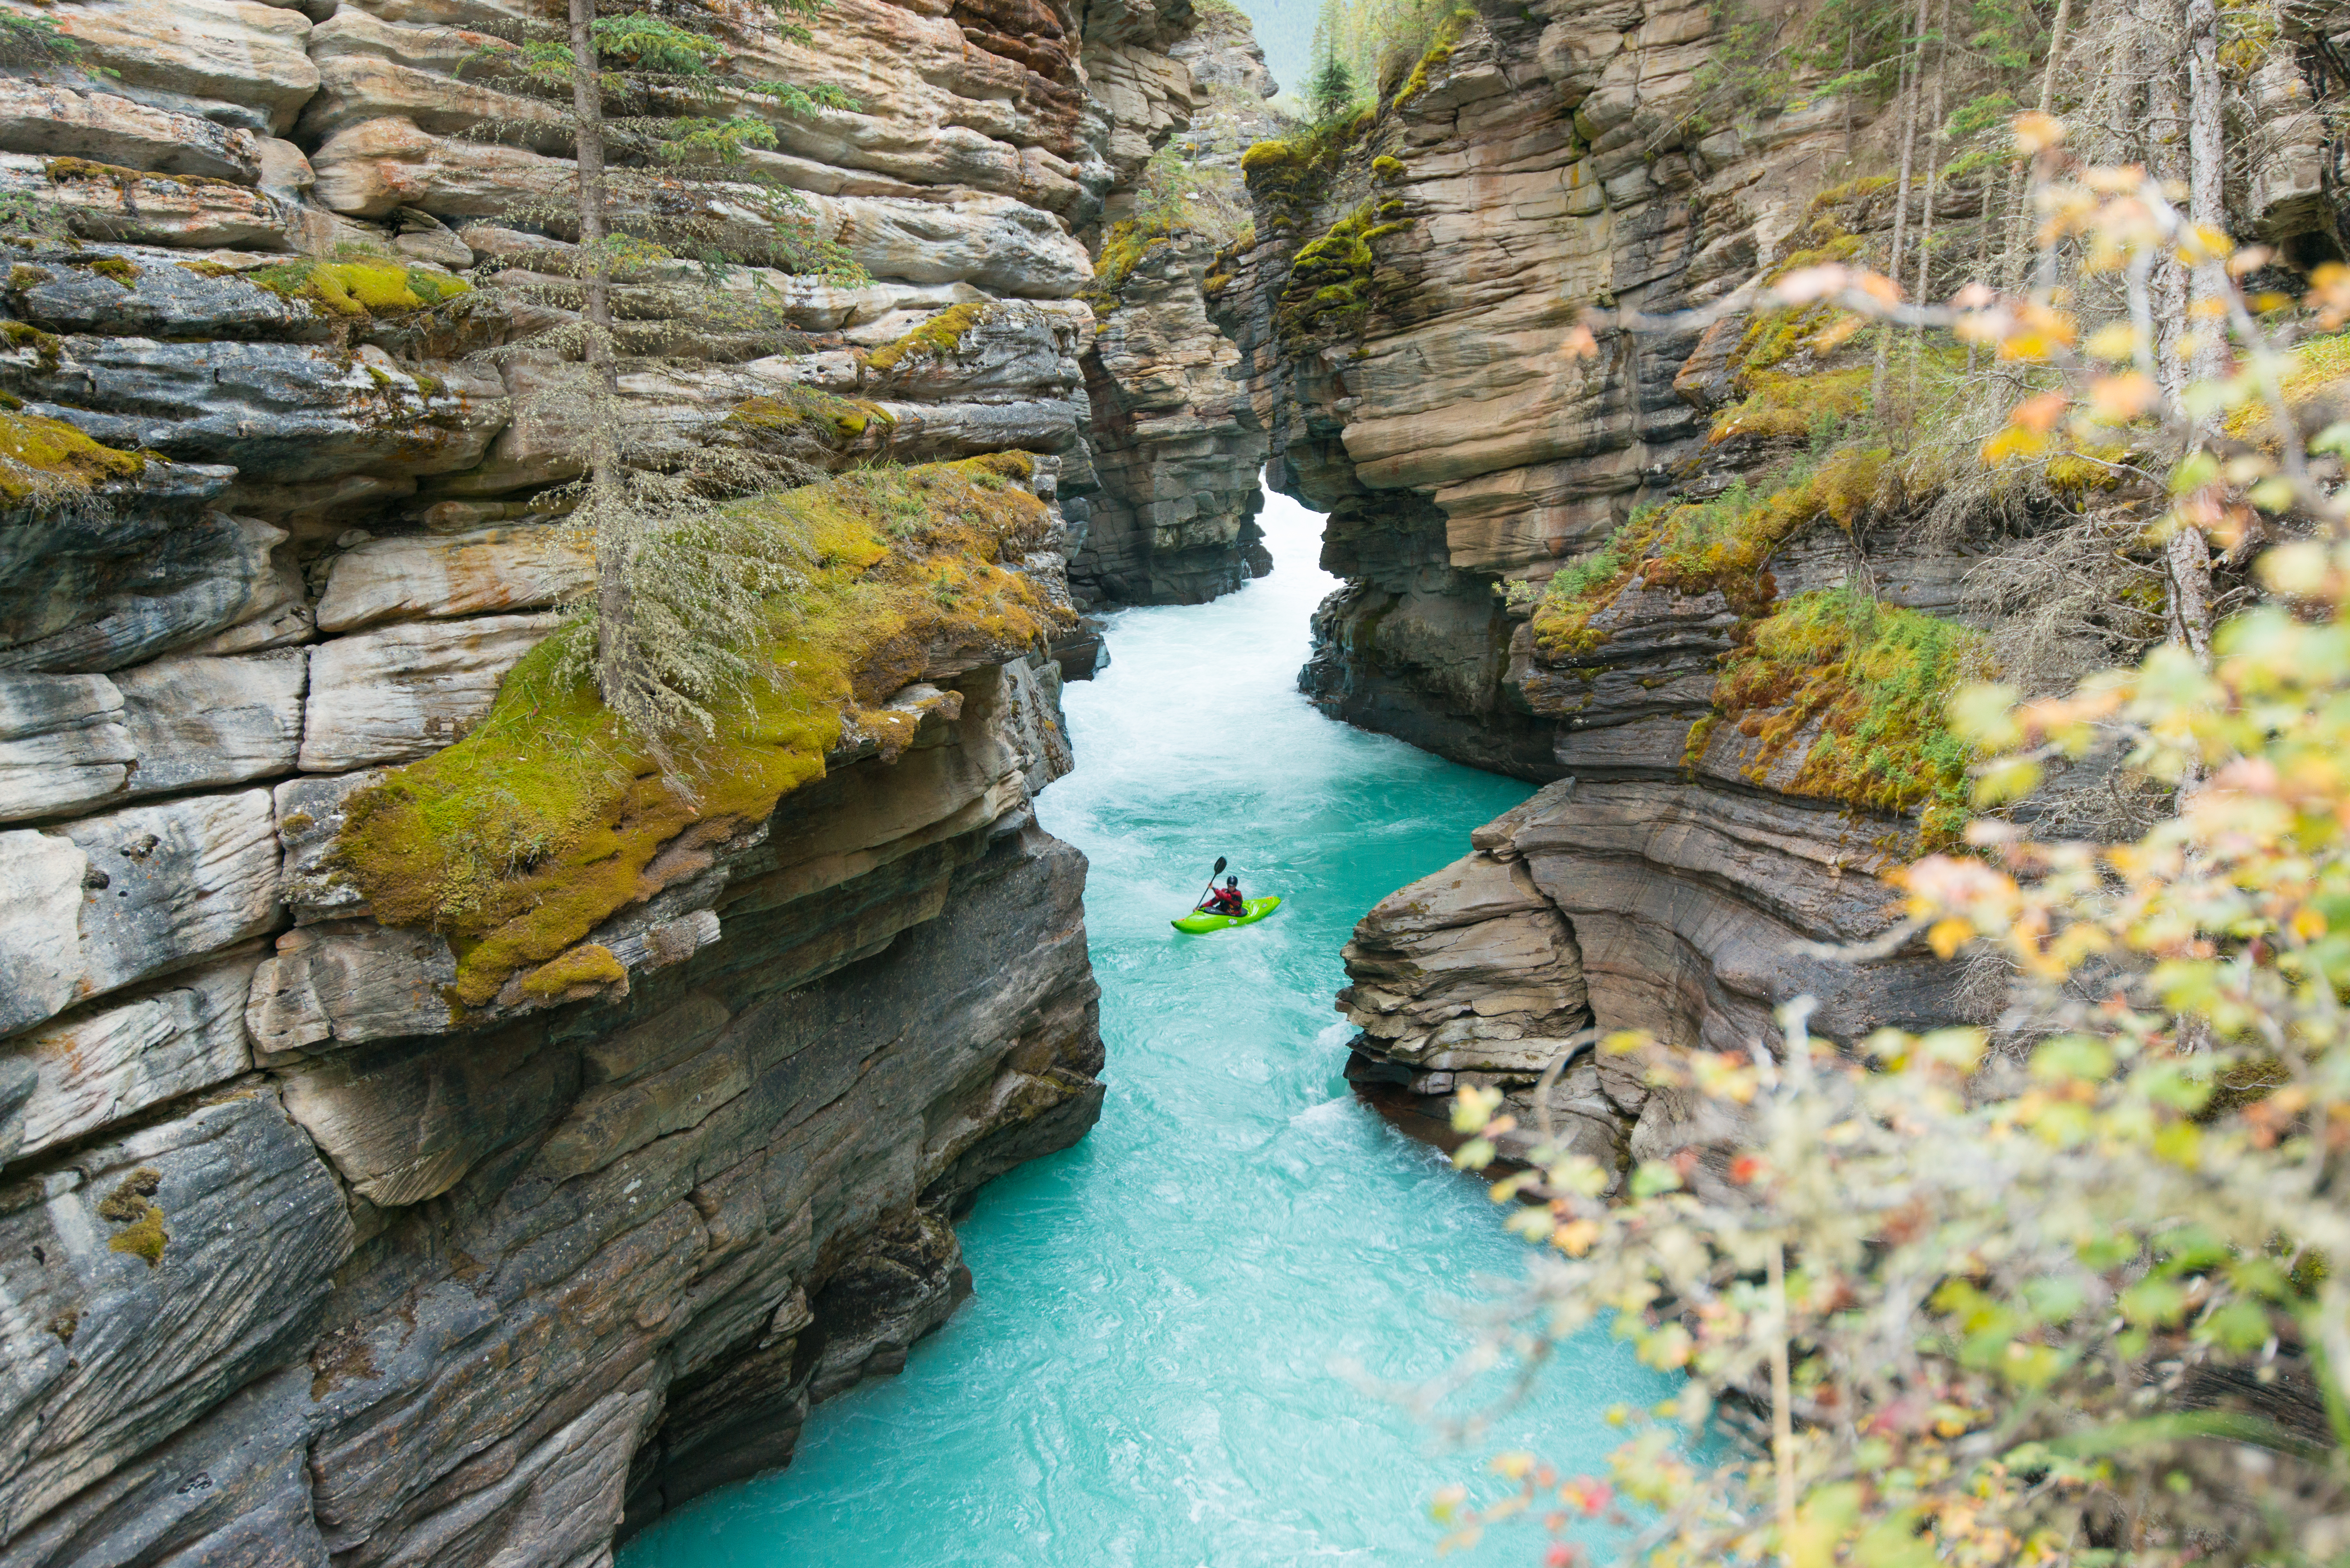 Athabasca Falls HD wallpapers, Desktop wallpaper - most viewed